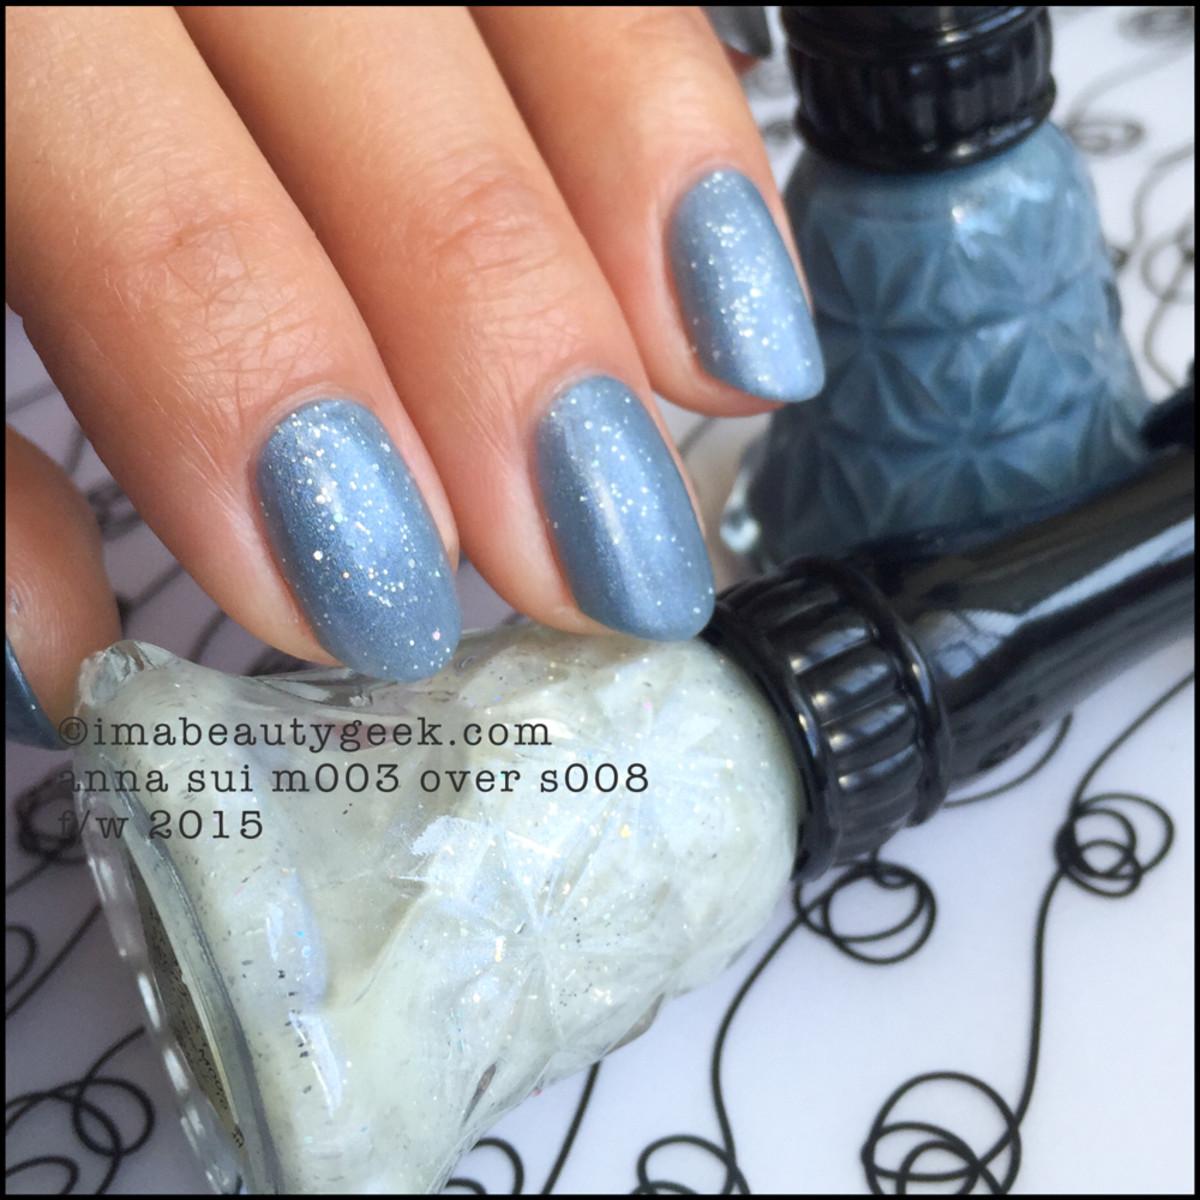 Anna Sui Nail Polish m003 over s008_Anna Sui Nail Color 2015